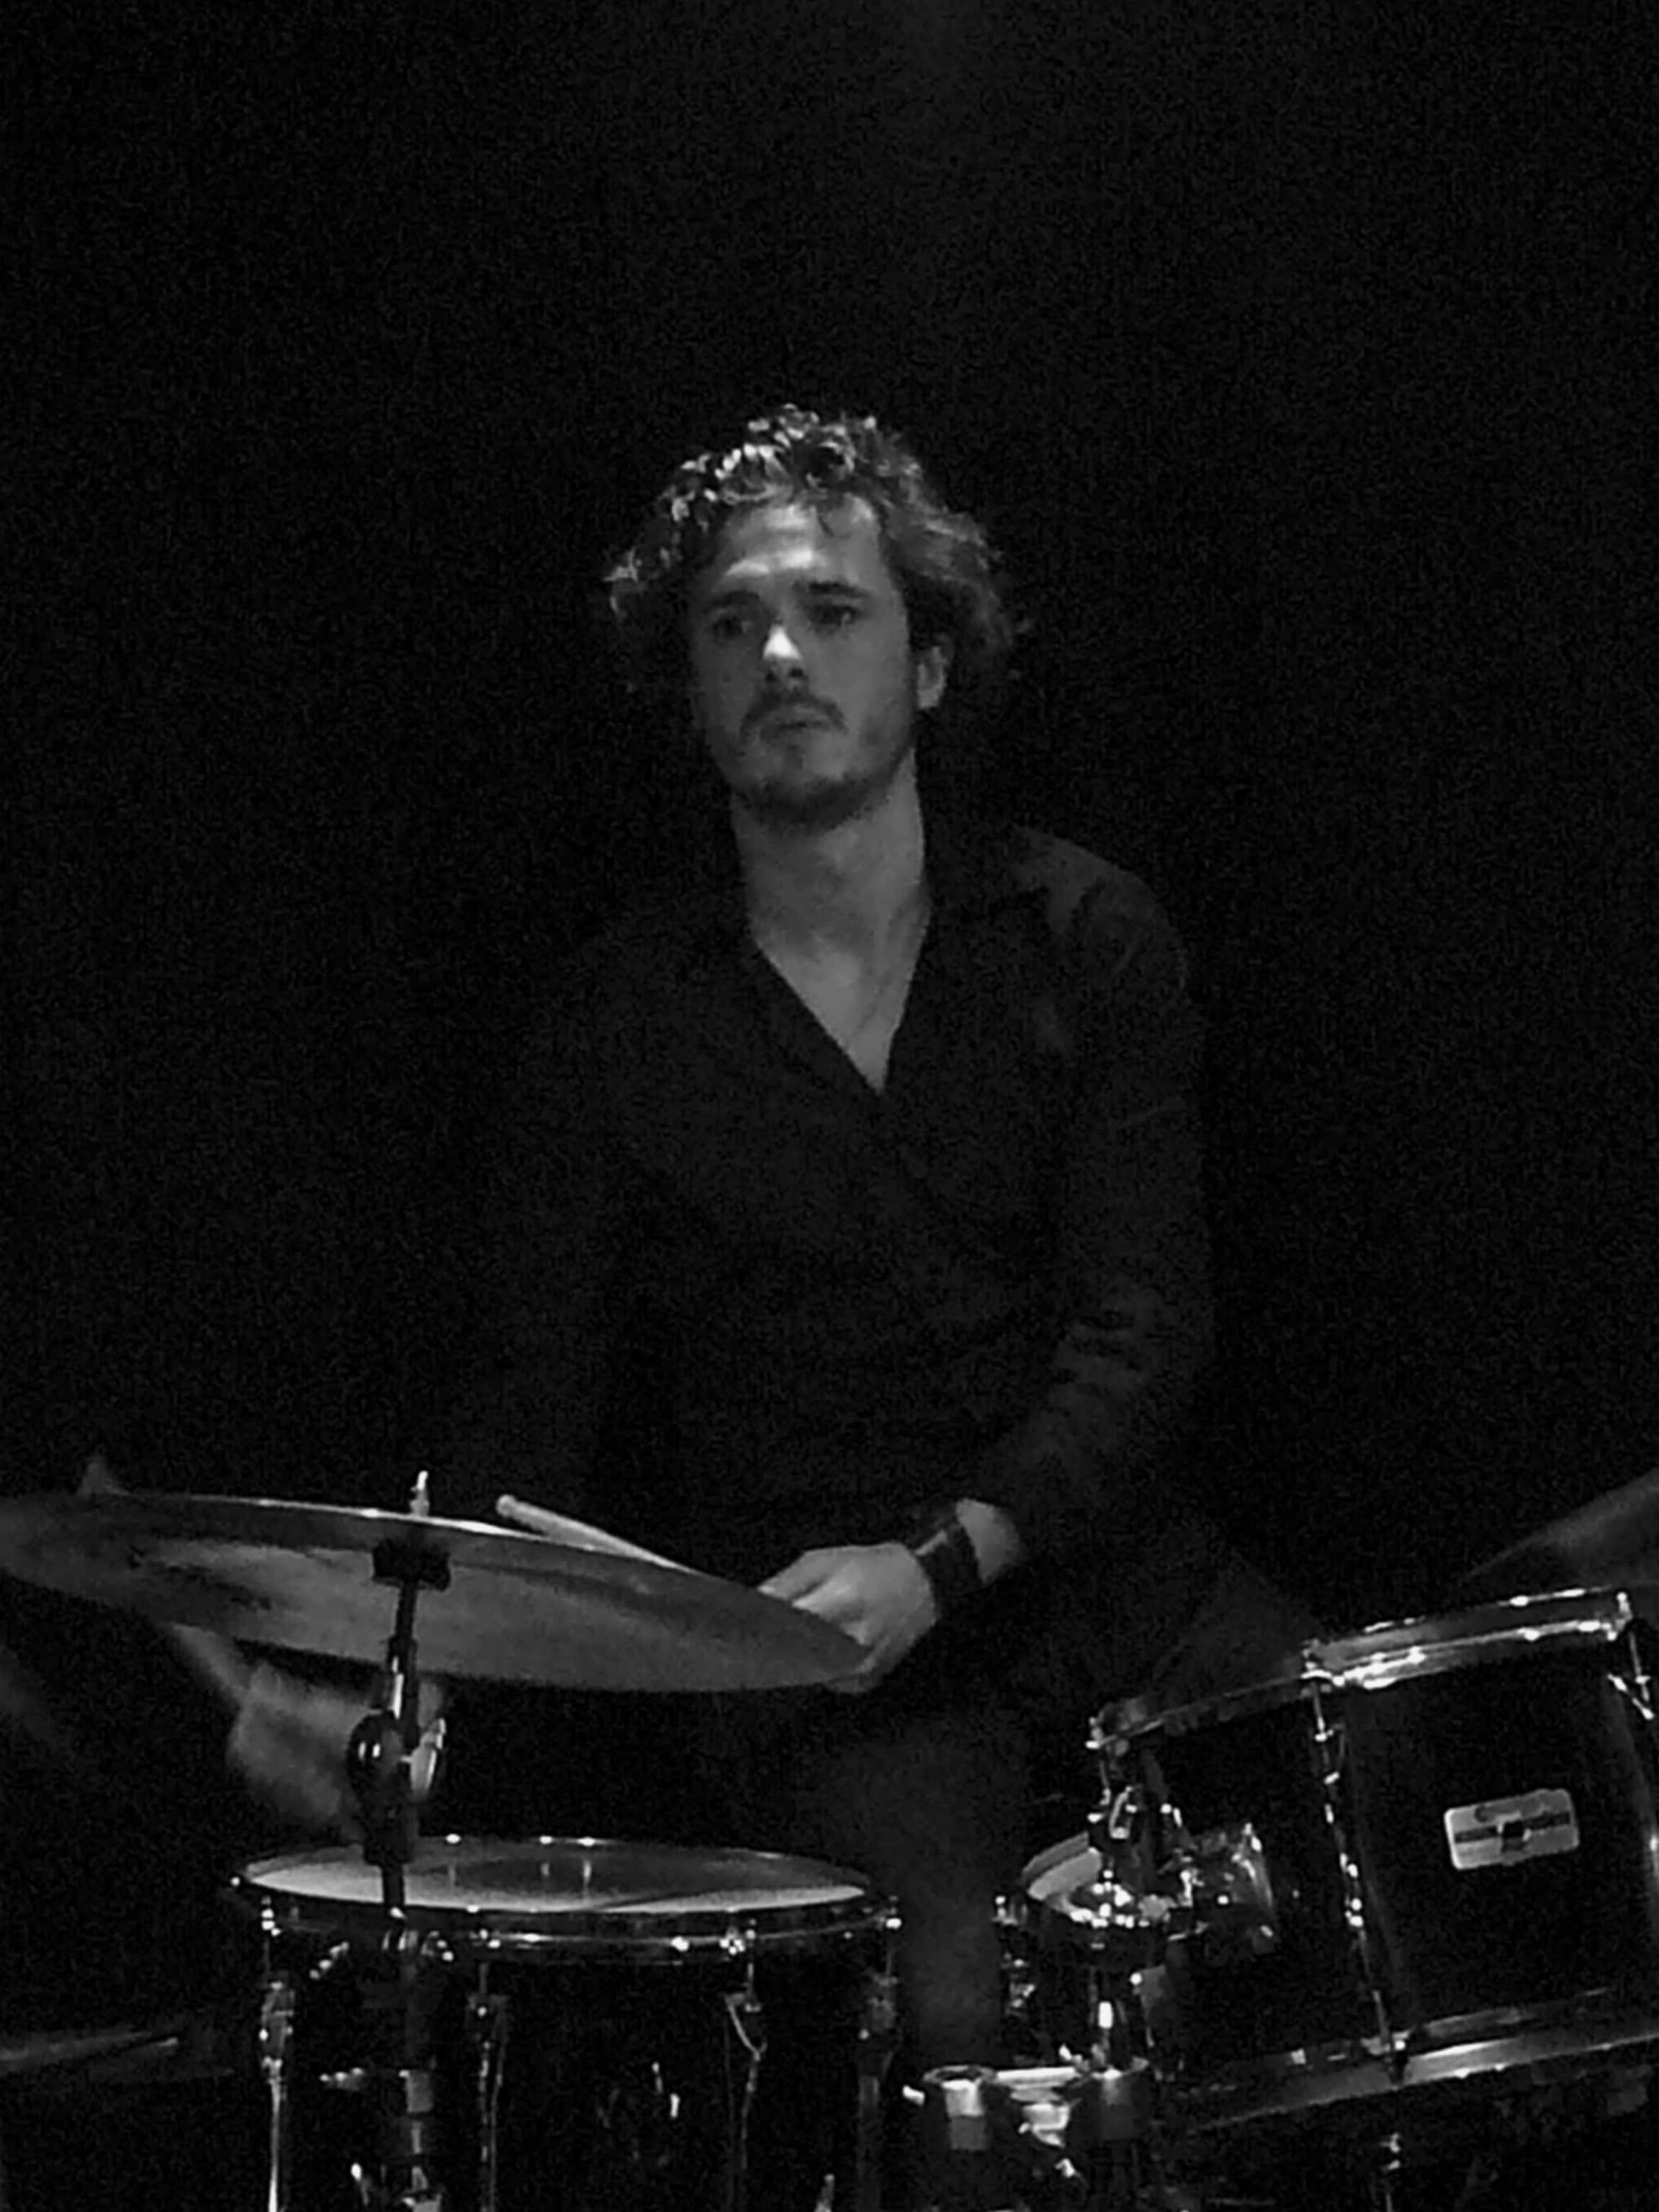 Matthieu Chazarenc